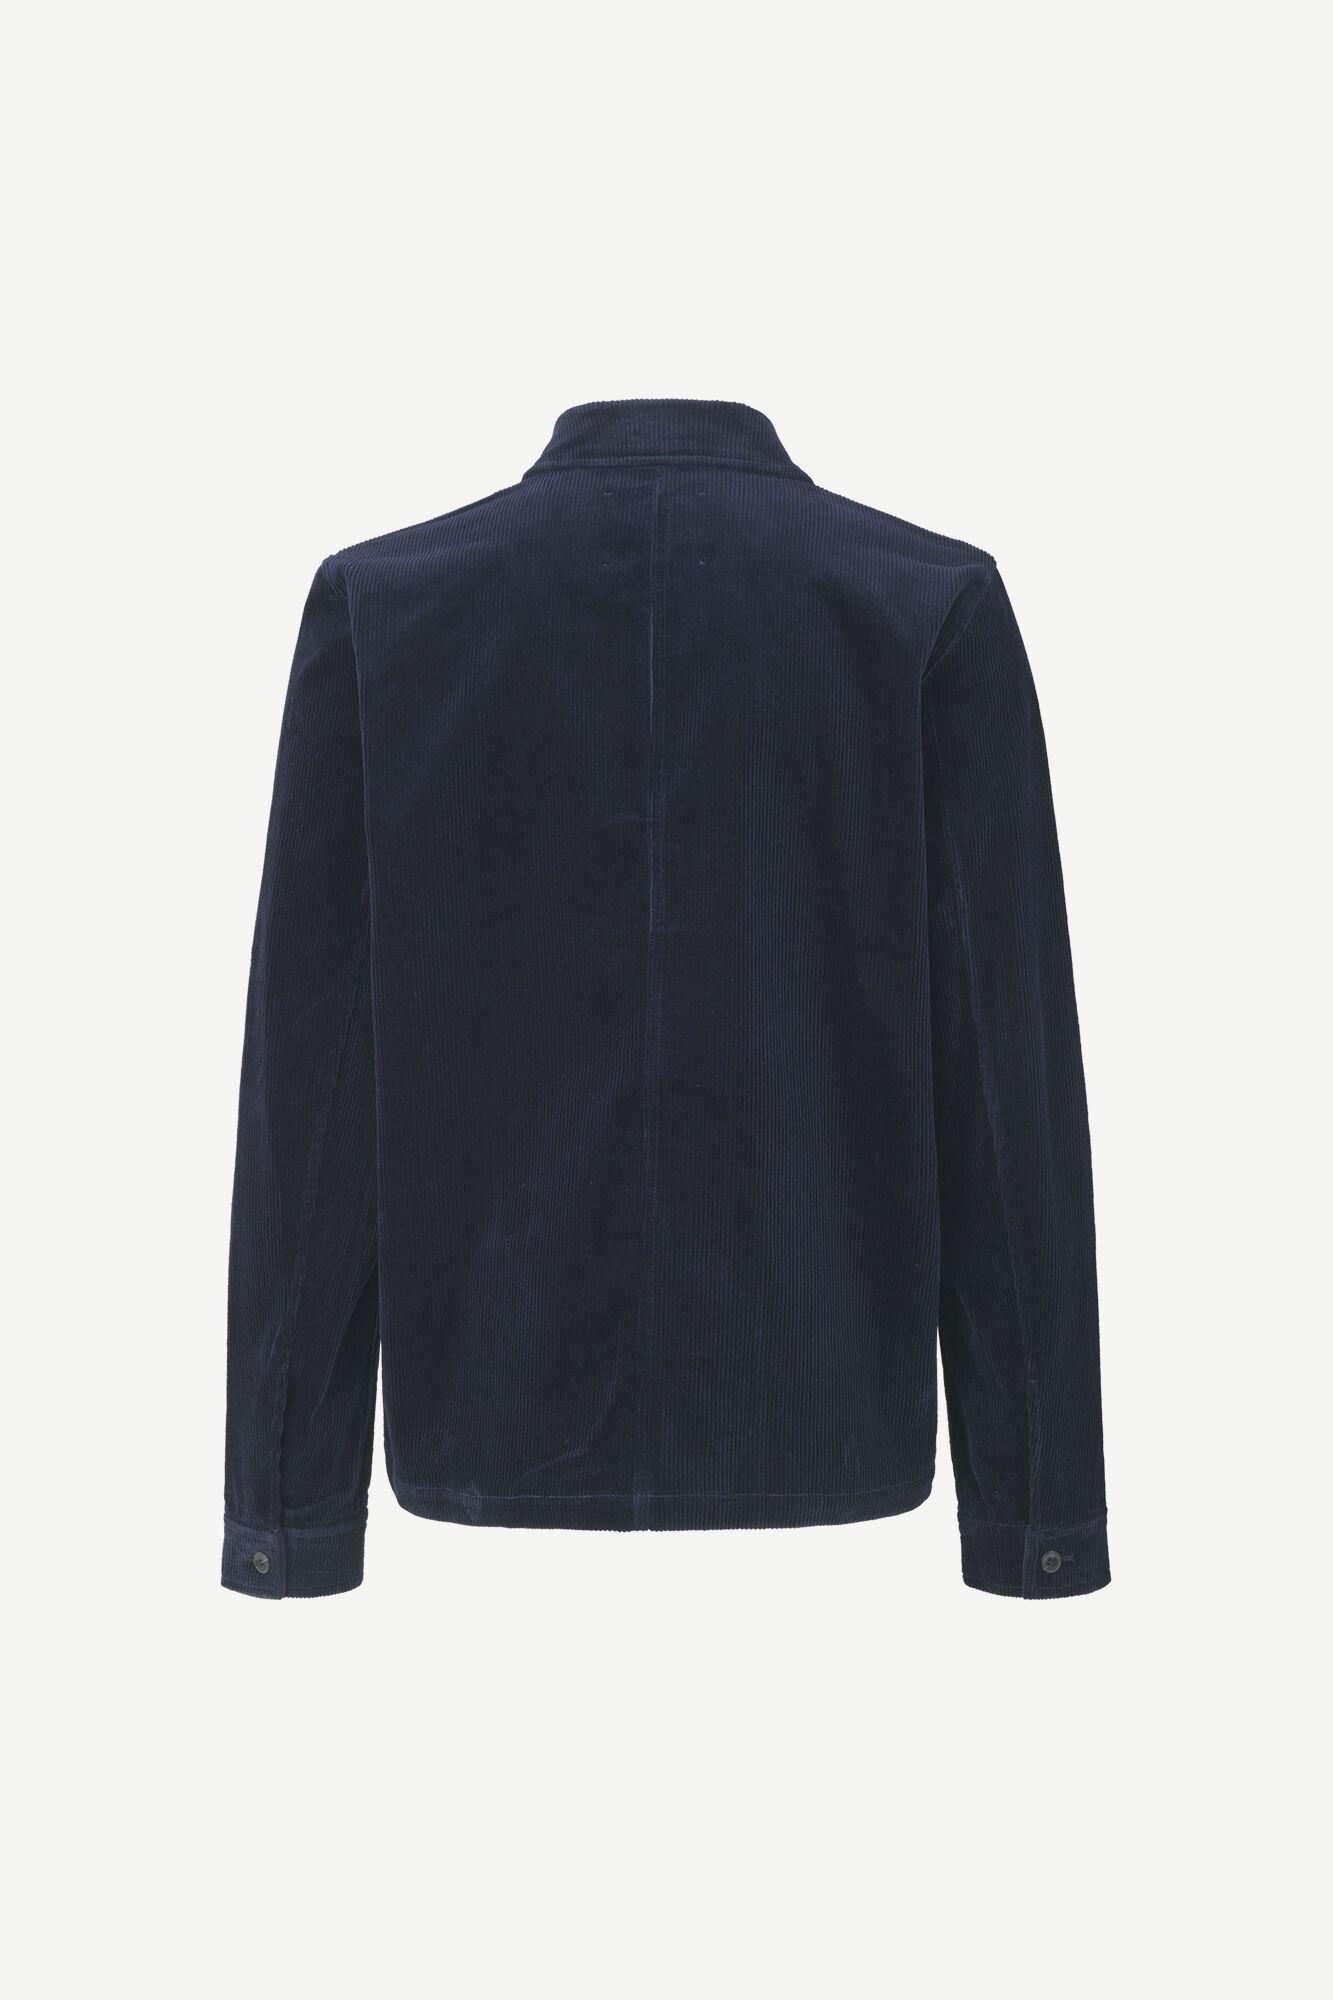 Worker jacket 11046